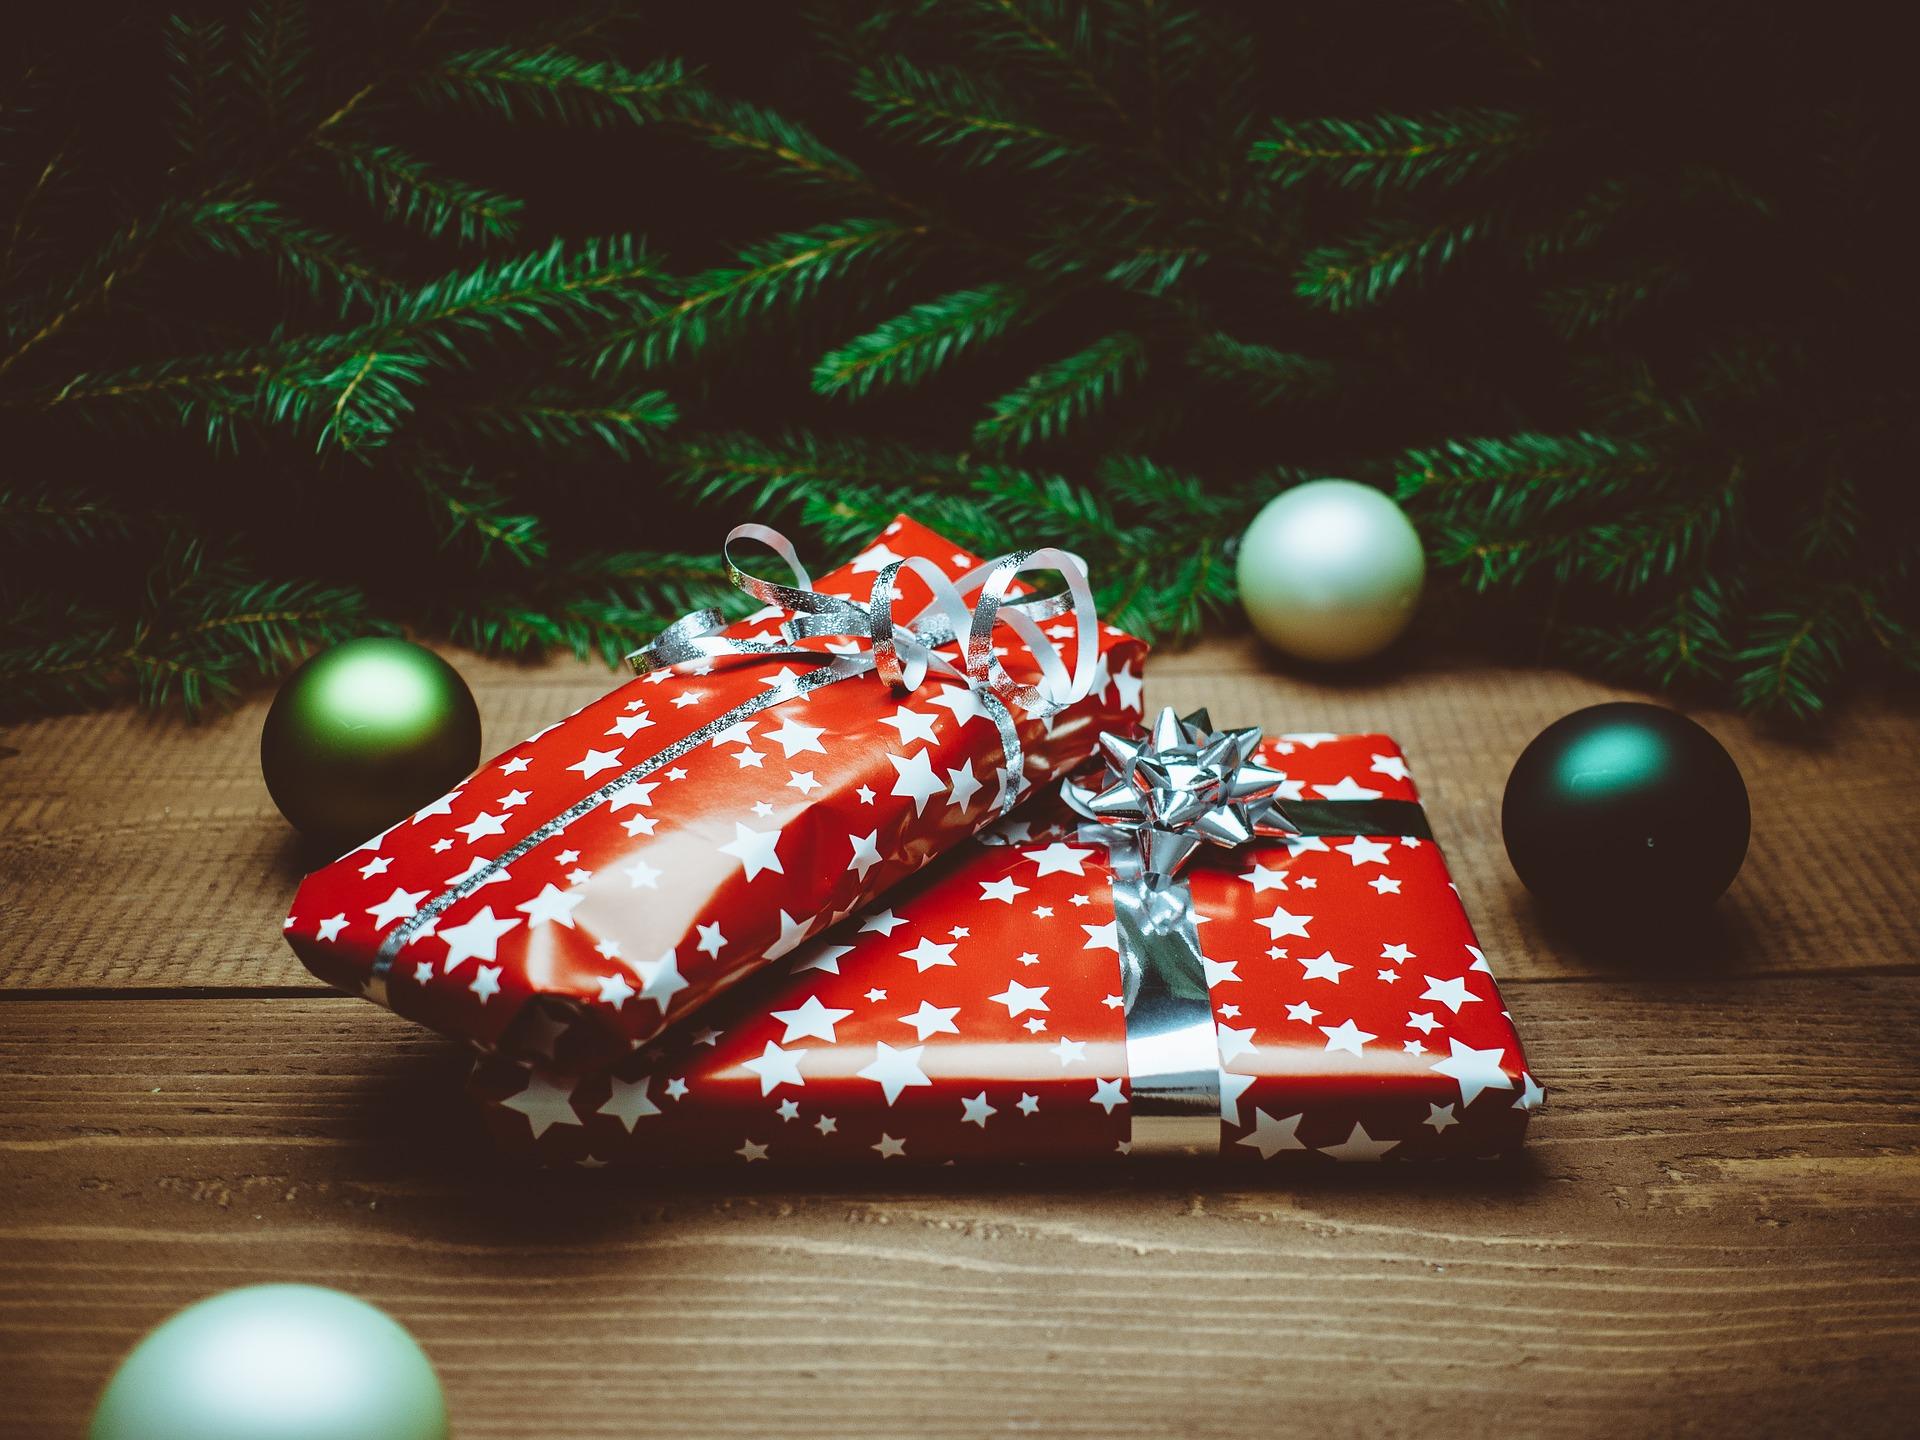 Christmas Charity Gifts Uk Part - 39: Virtual Christmas Gifts